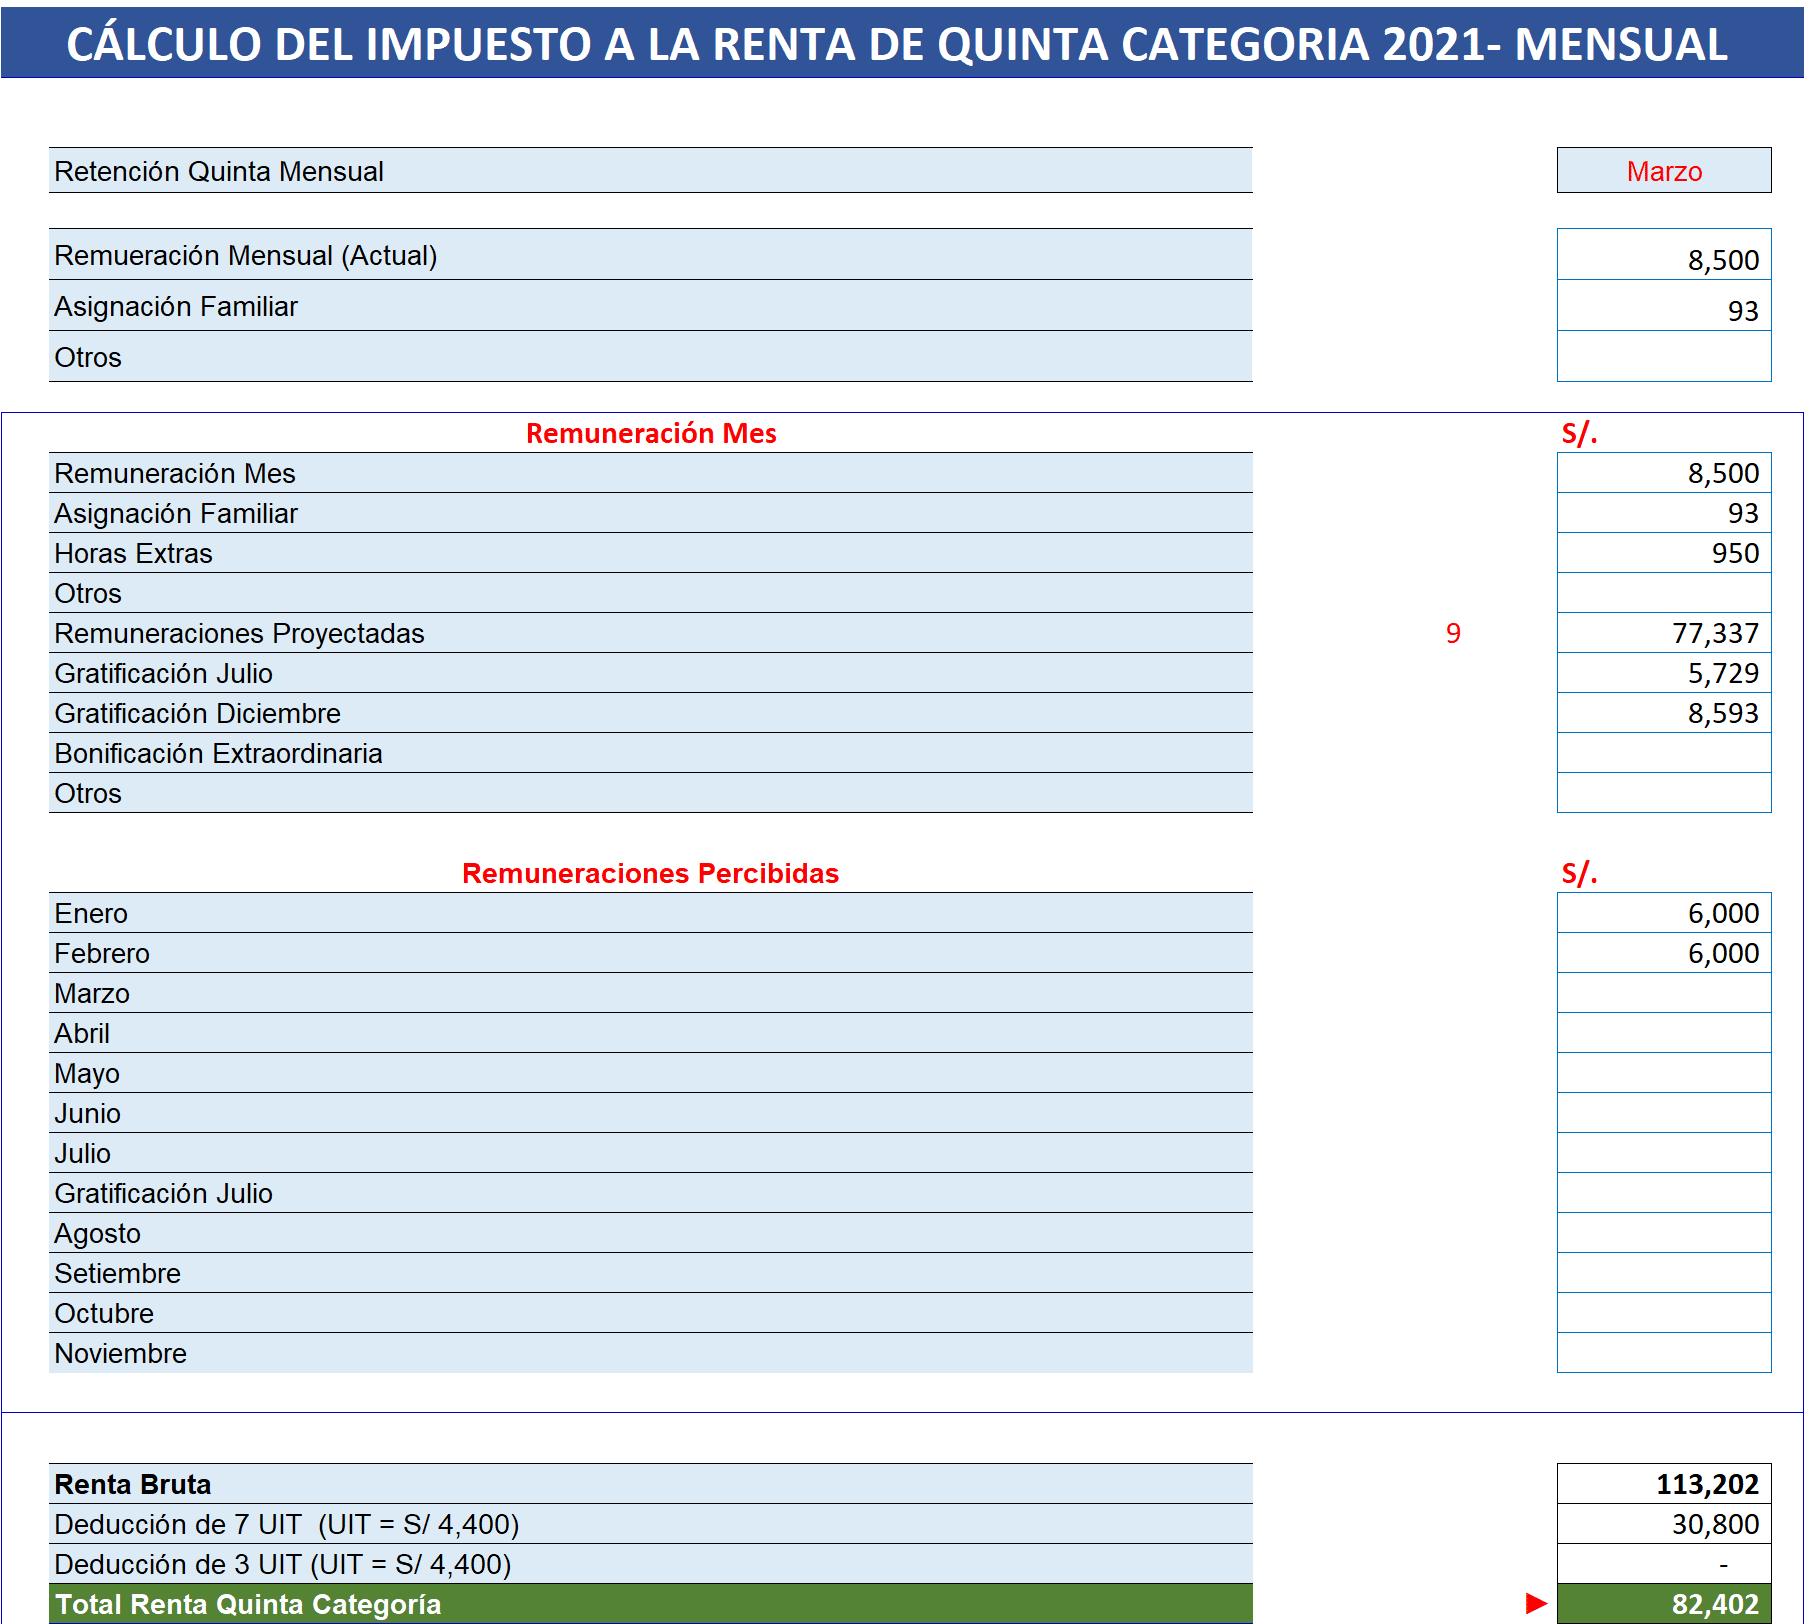 Renta de Quinta Categoria 2021